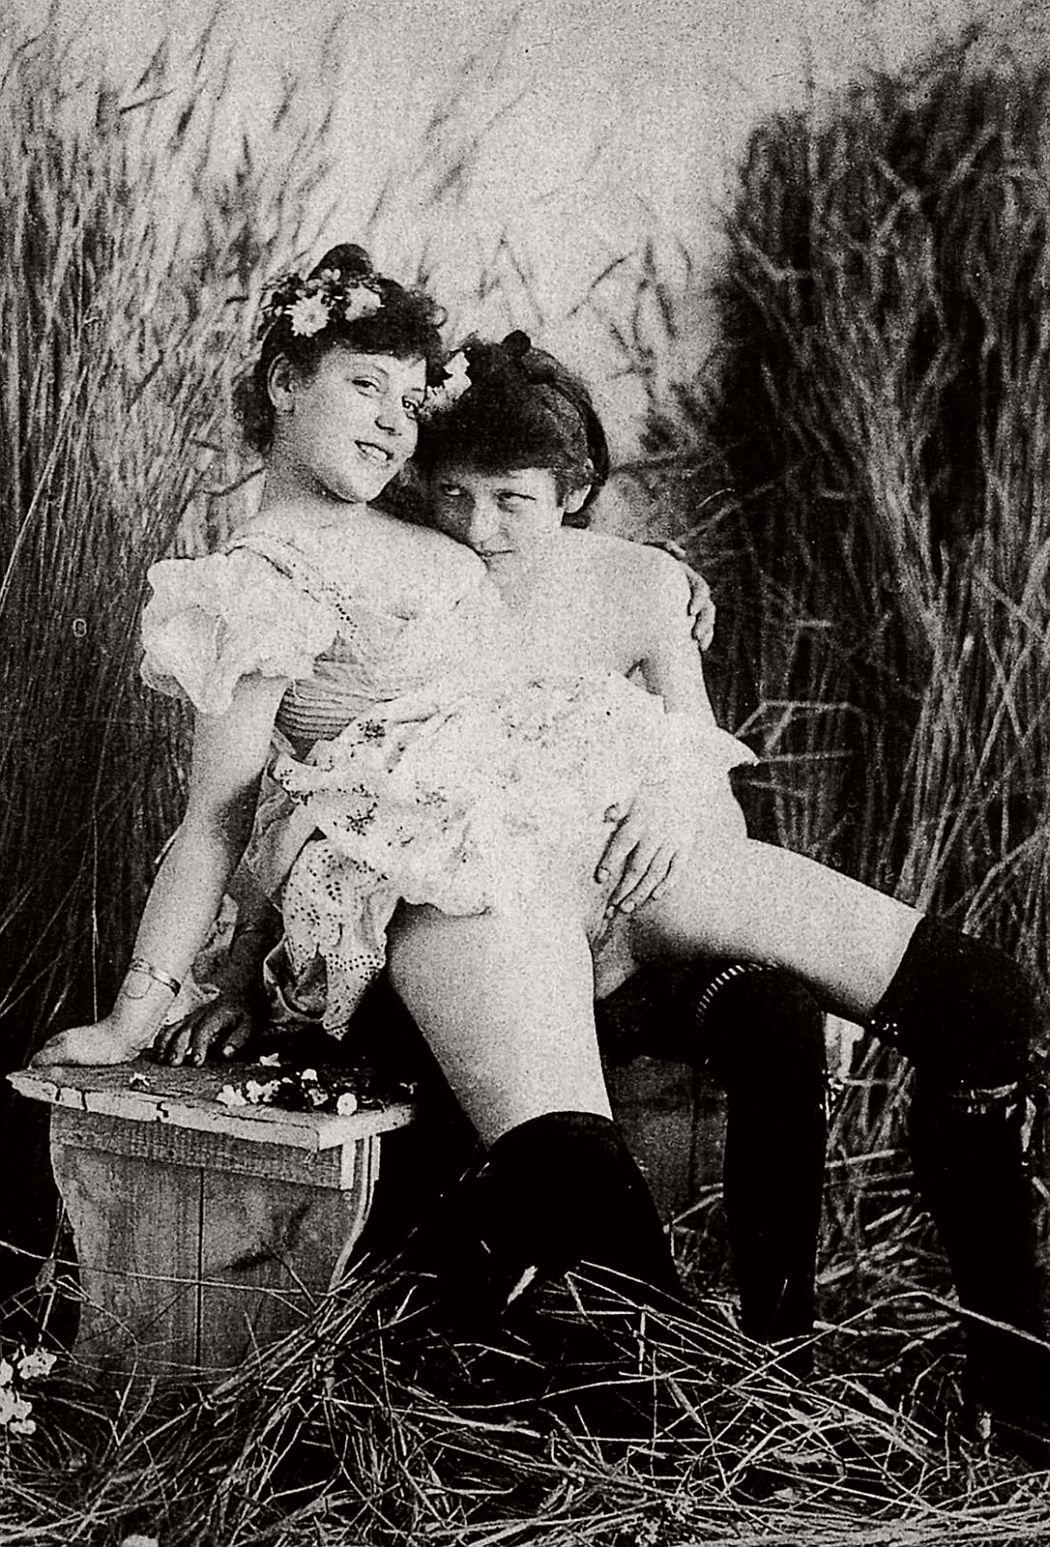 vintage-ninetenth-century-lesbian-women-nudes-1880s-02